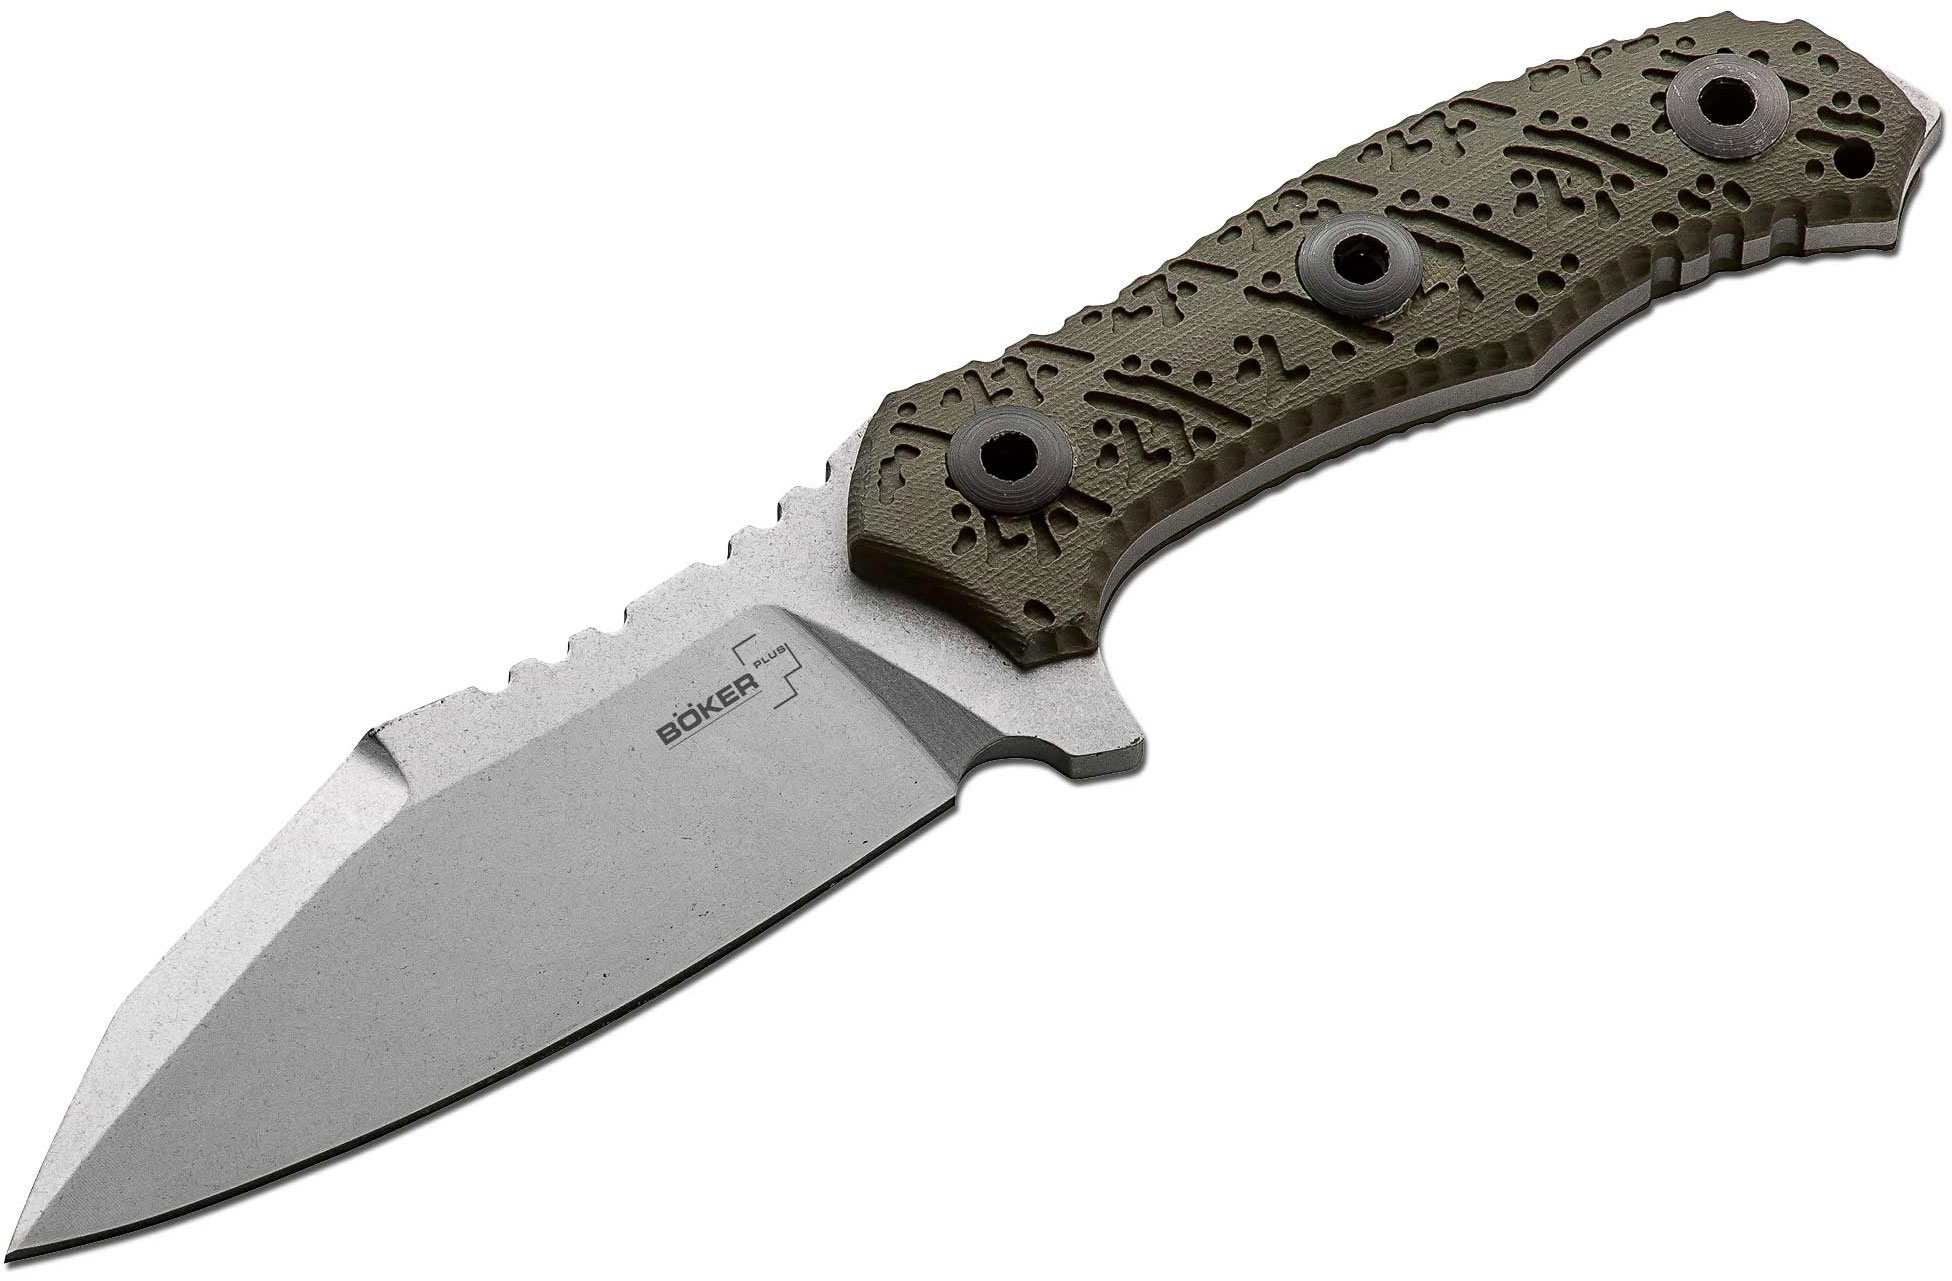 Boker Plus Colubris Fixed 4.25 inch Stonewash Blade, G10 Handles